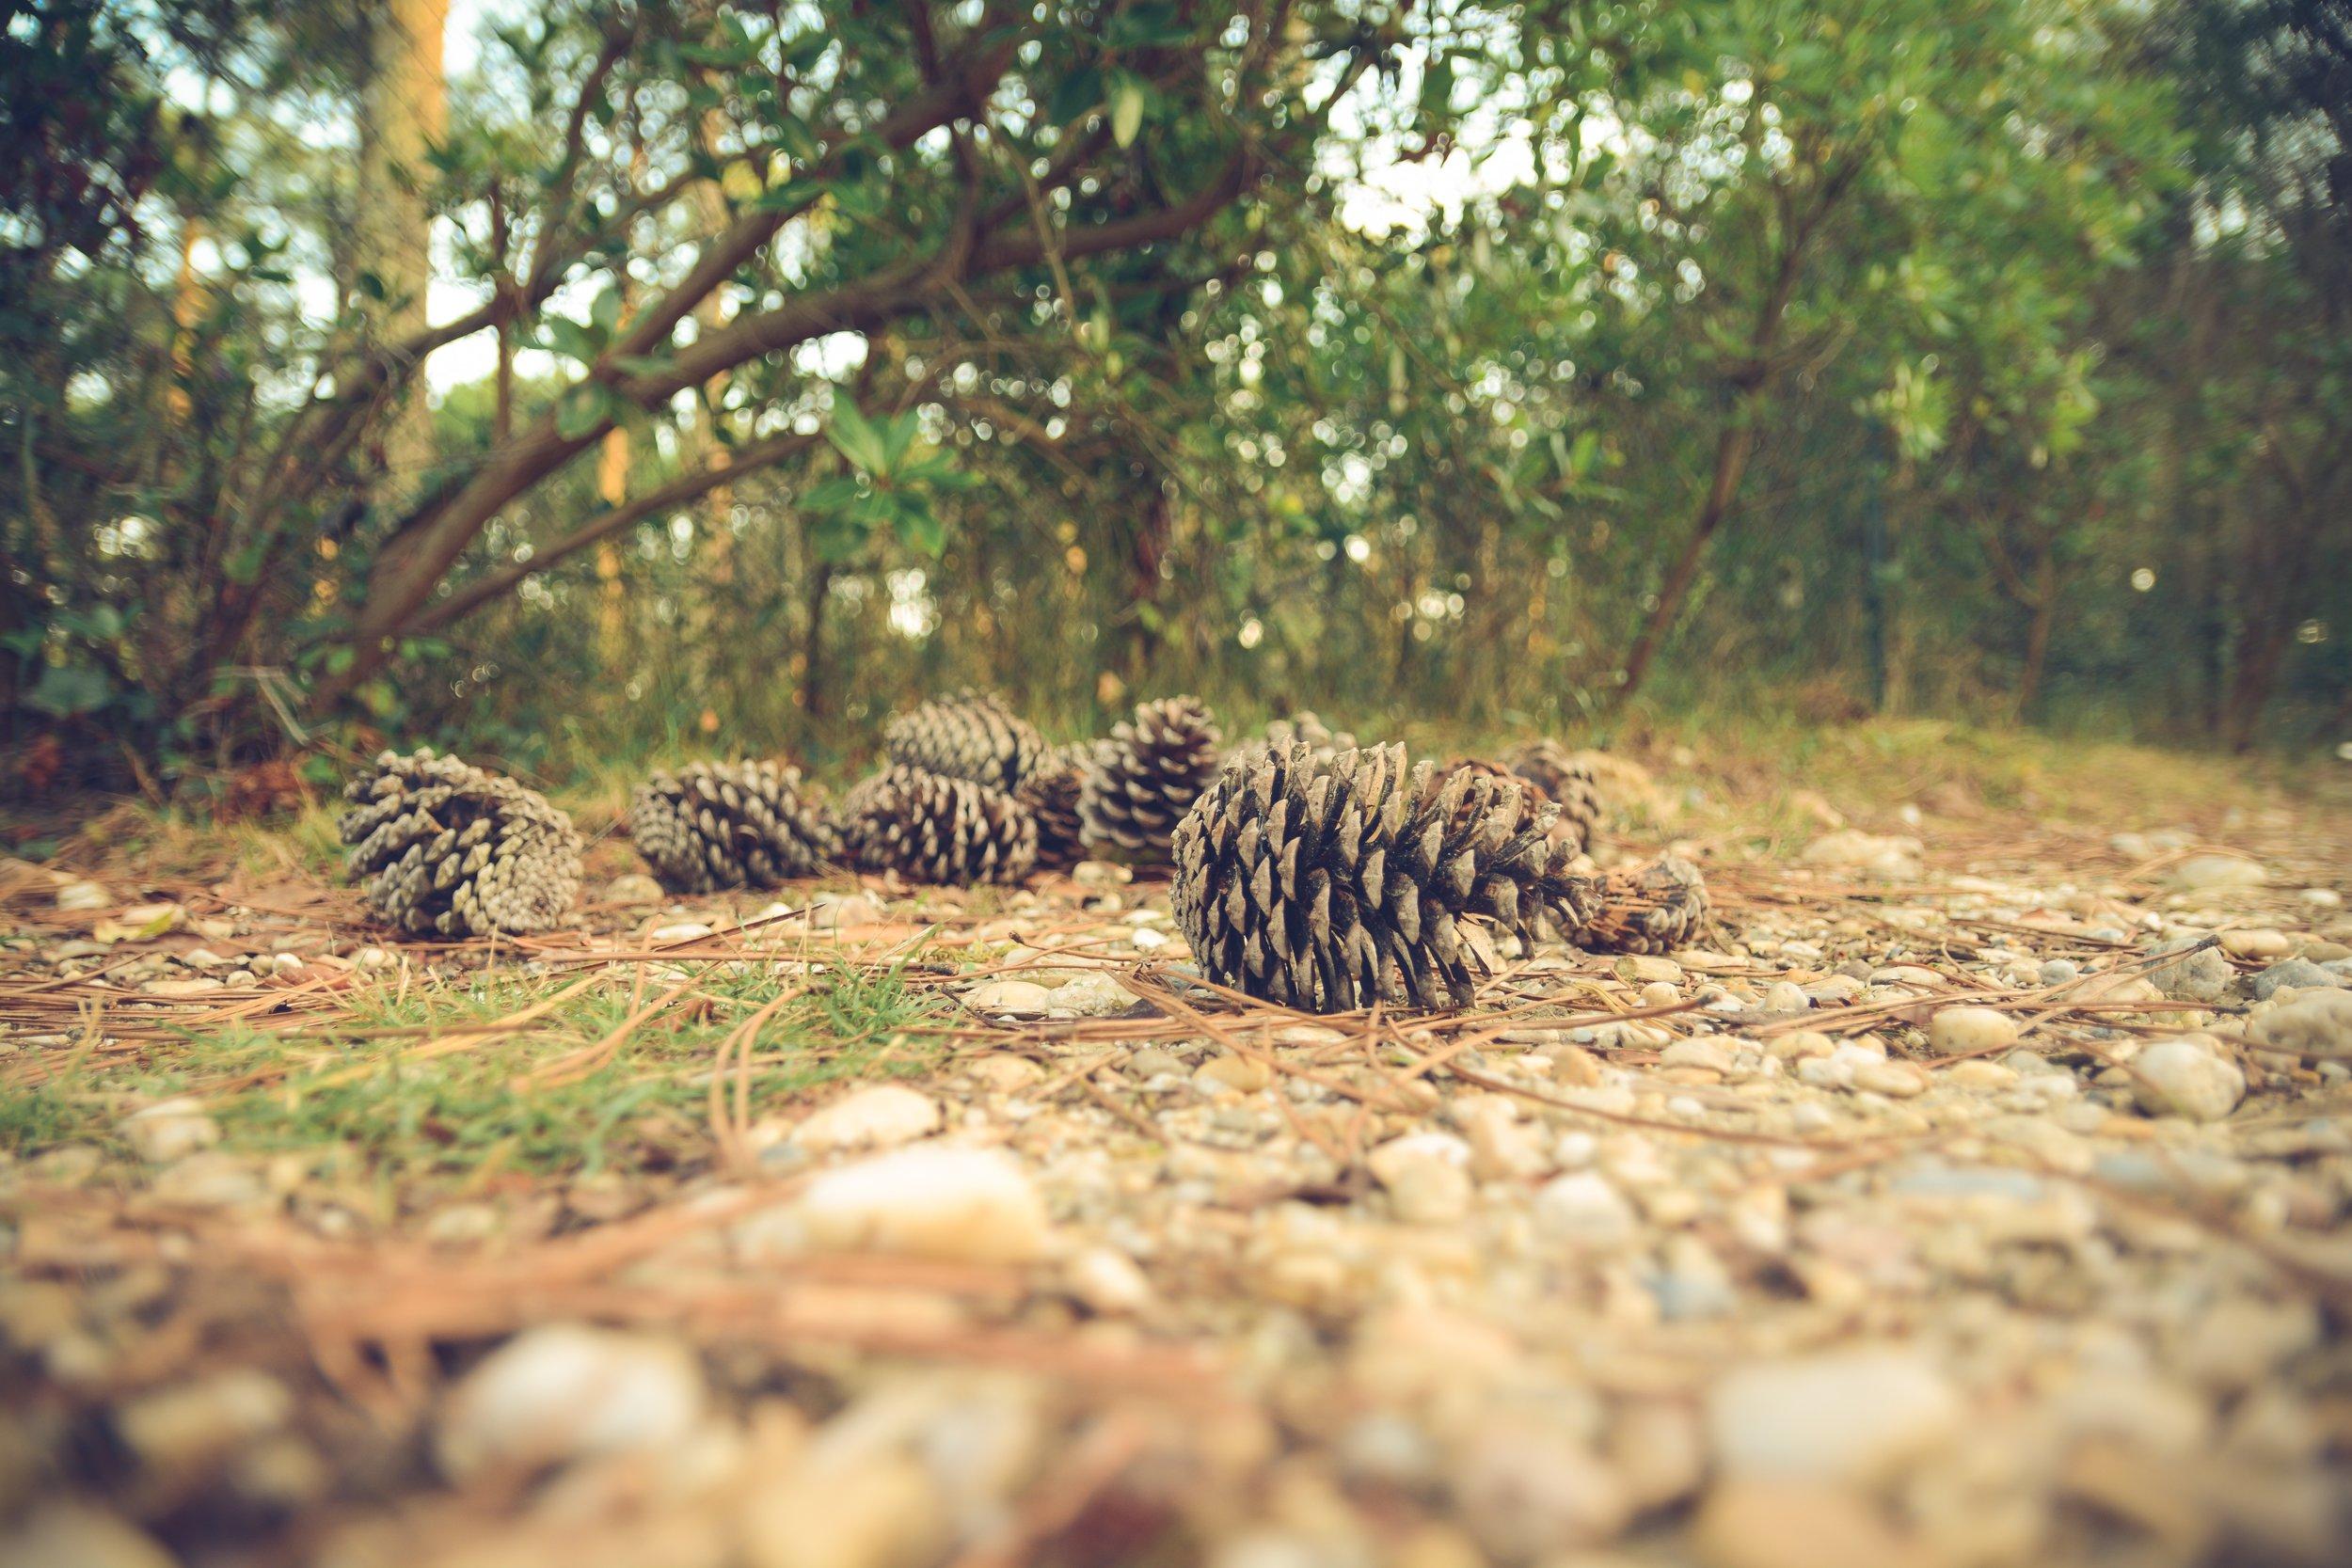 chris-lawton-pinecone floor-unsplash.jpg